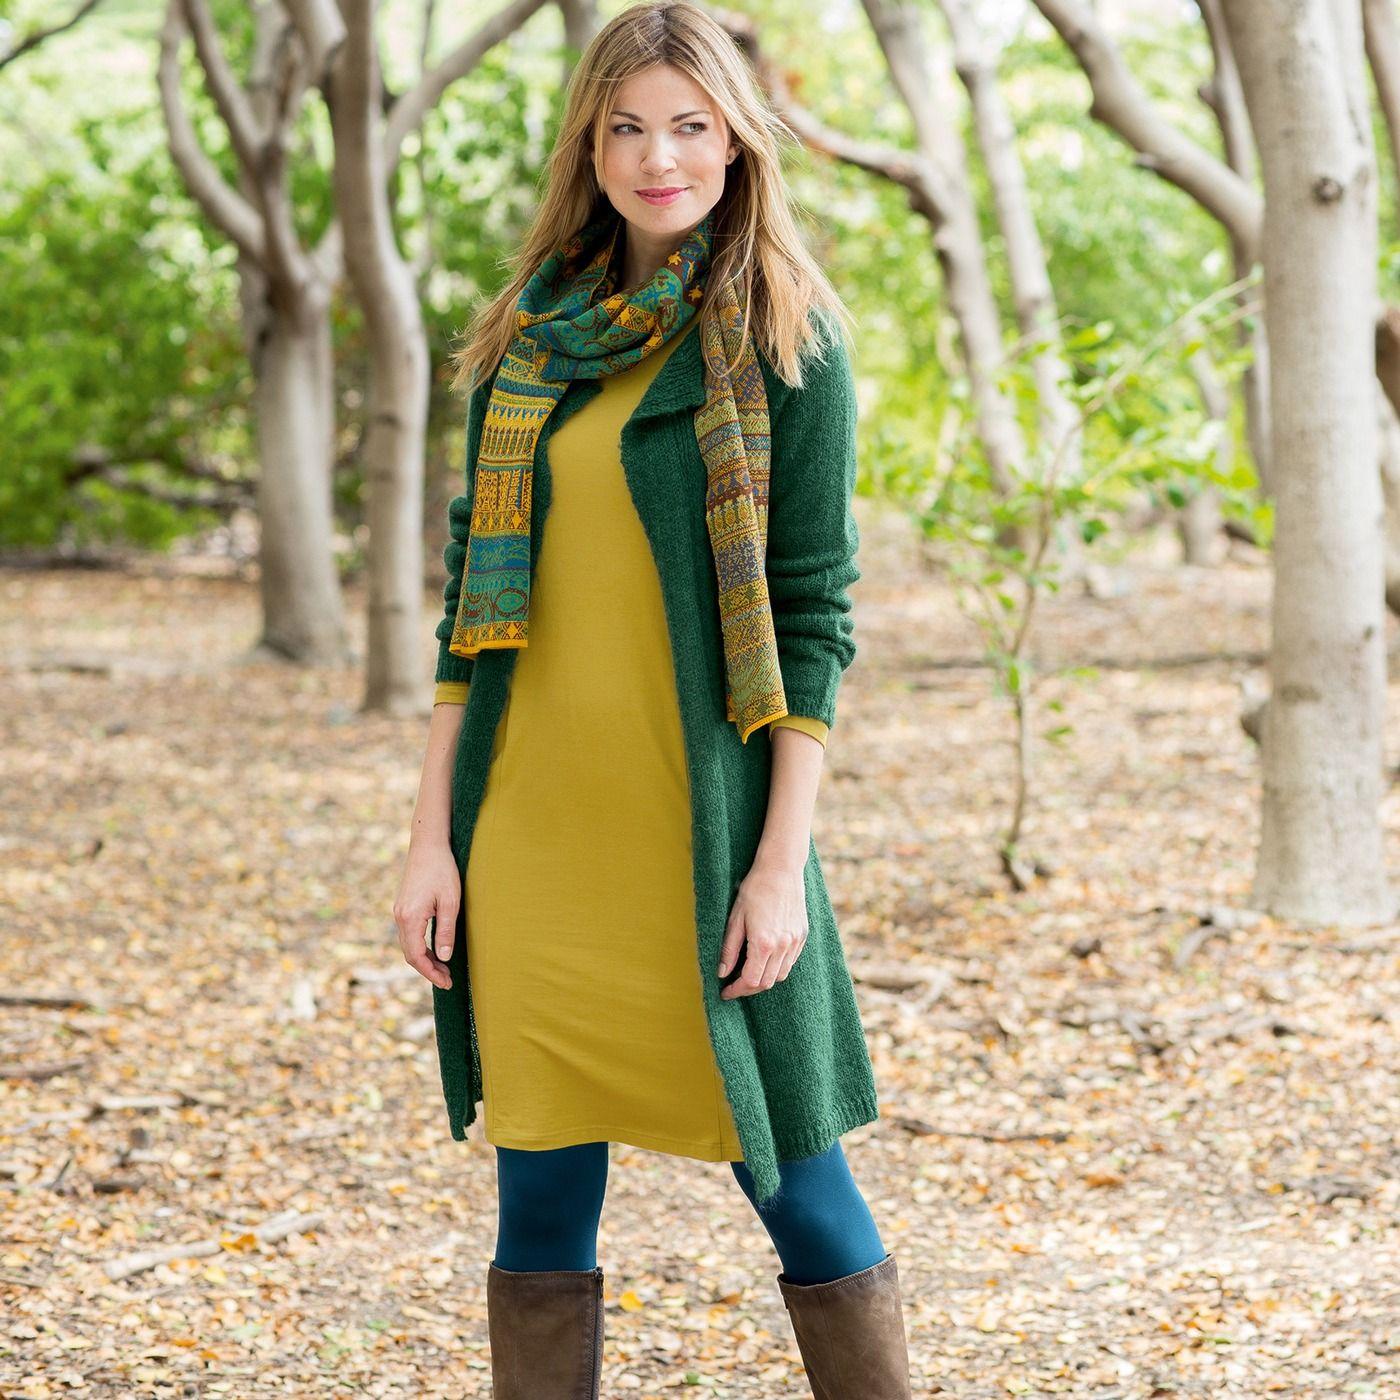 Kleid Jill-Farbenfroh & fantasievoll-Style-Finder-Style ...